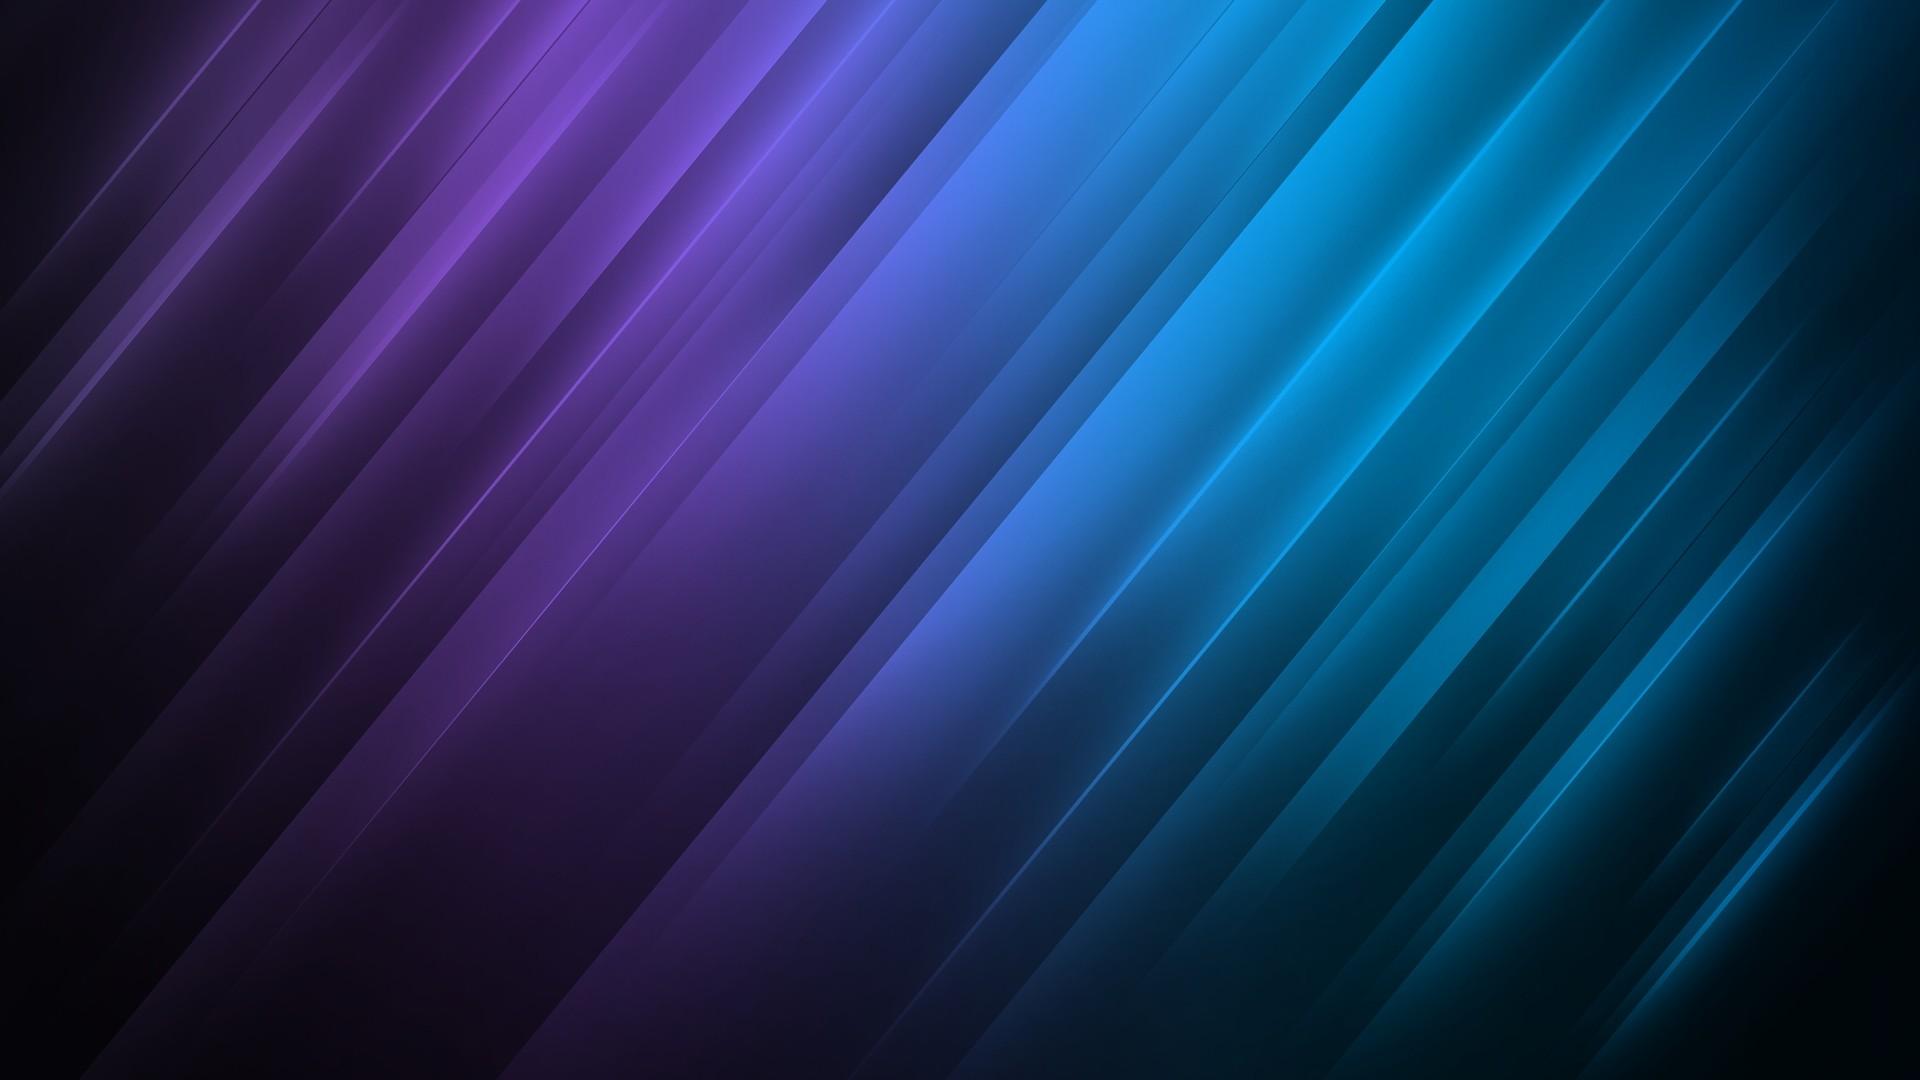 Gradient PC Wallpaper HD